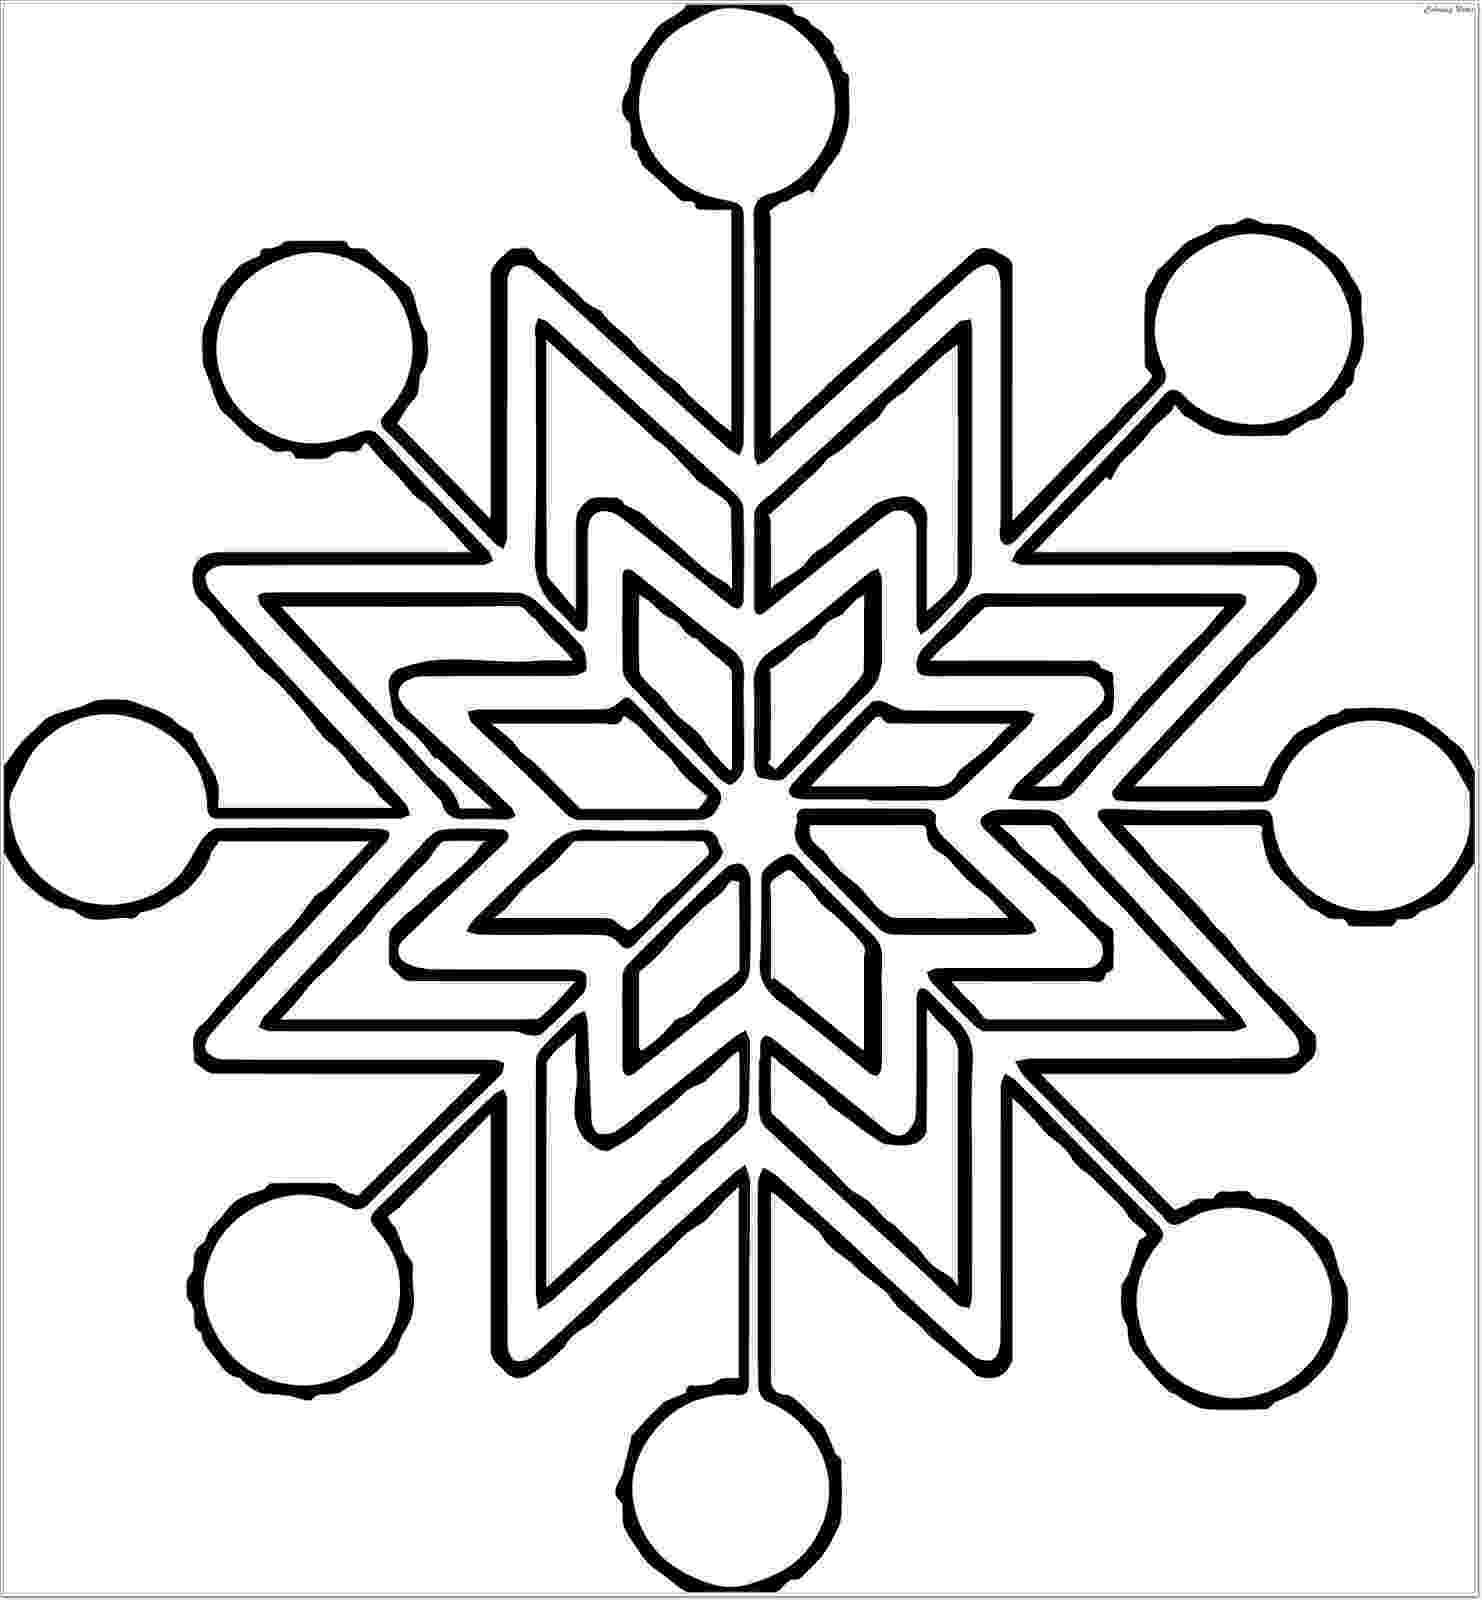 free snowflake coloring pages printable snowflake coloring pages for kids cool2bkids free pages snowflake coloring